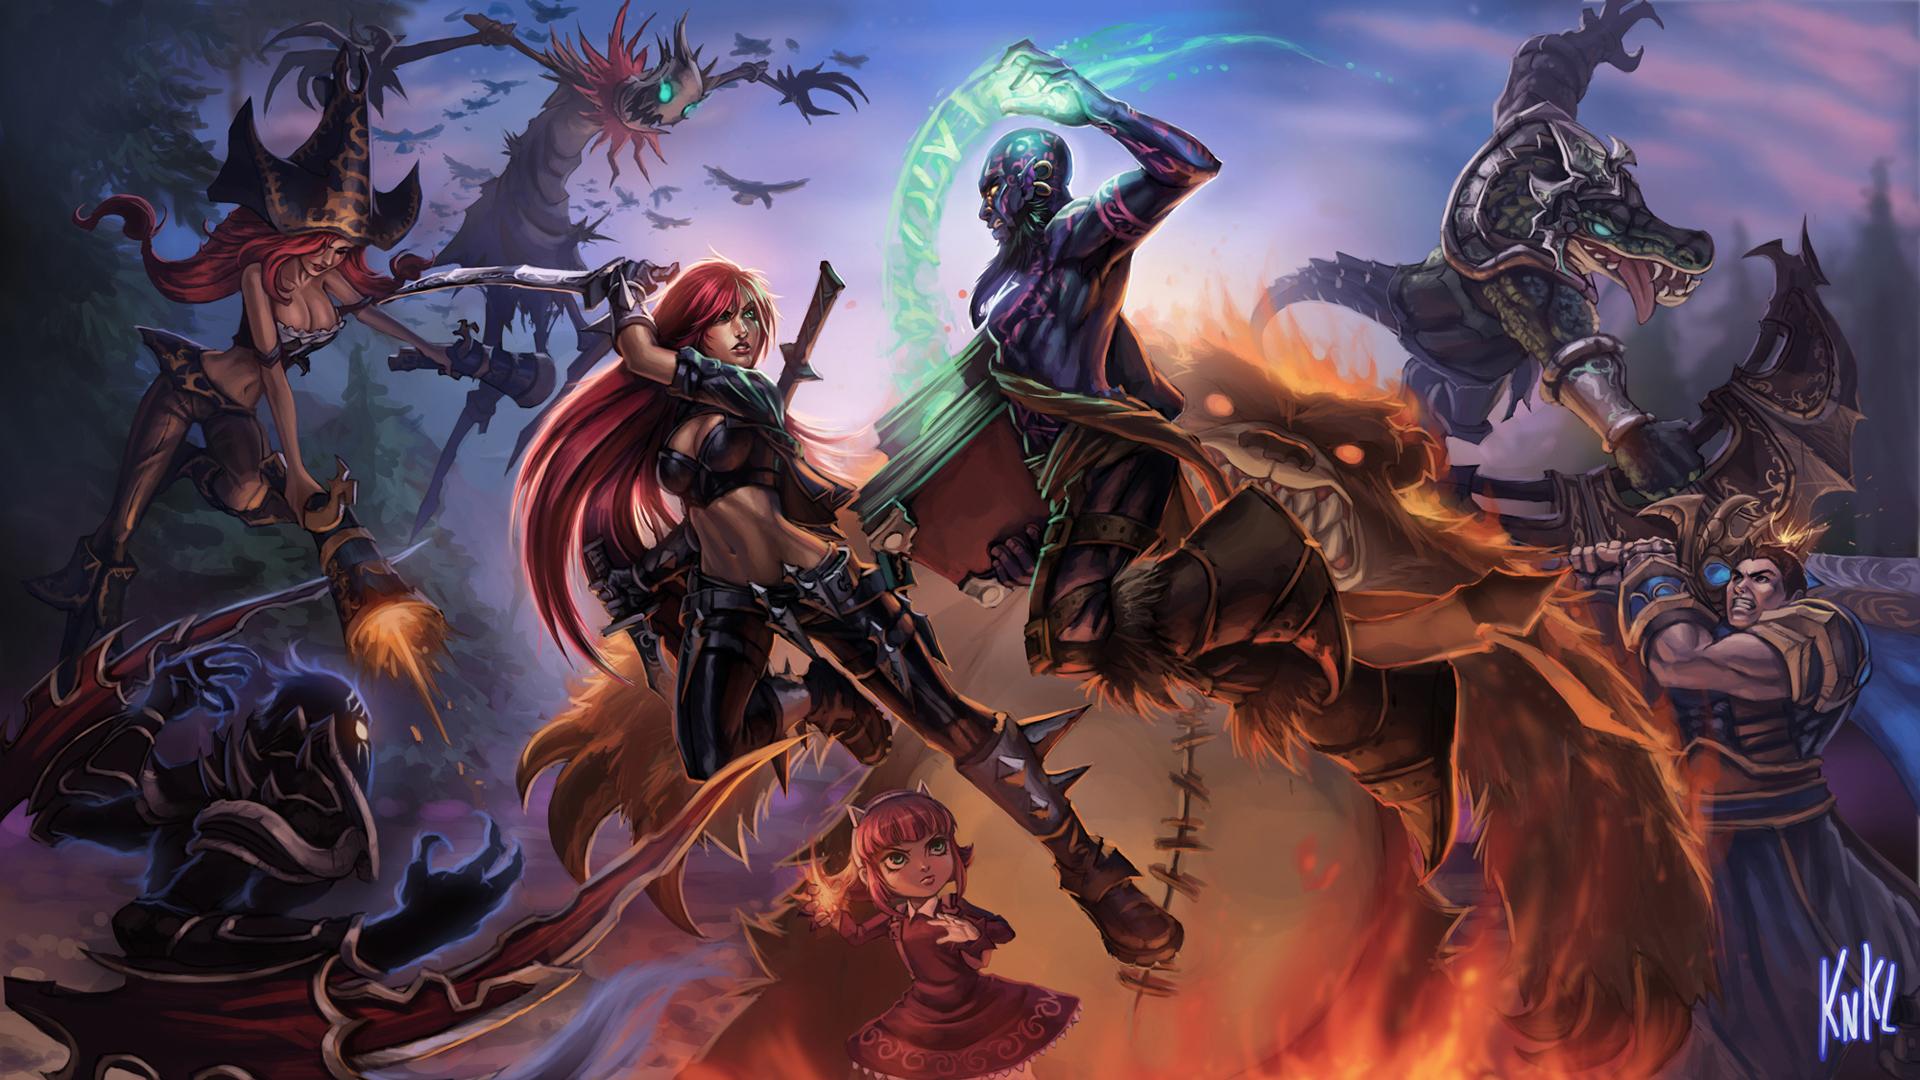 League Of Legends Wallpaper Darius Vs Garen And Gar